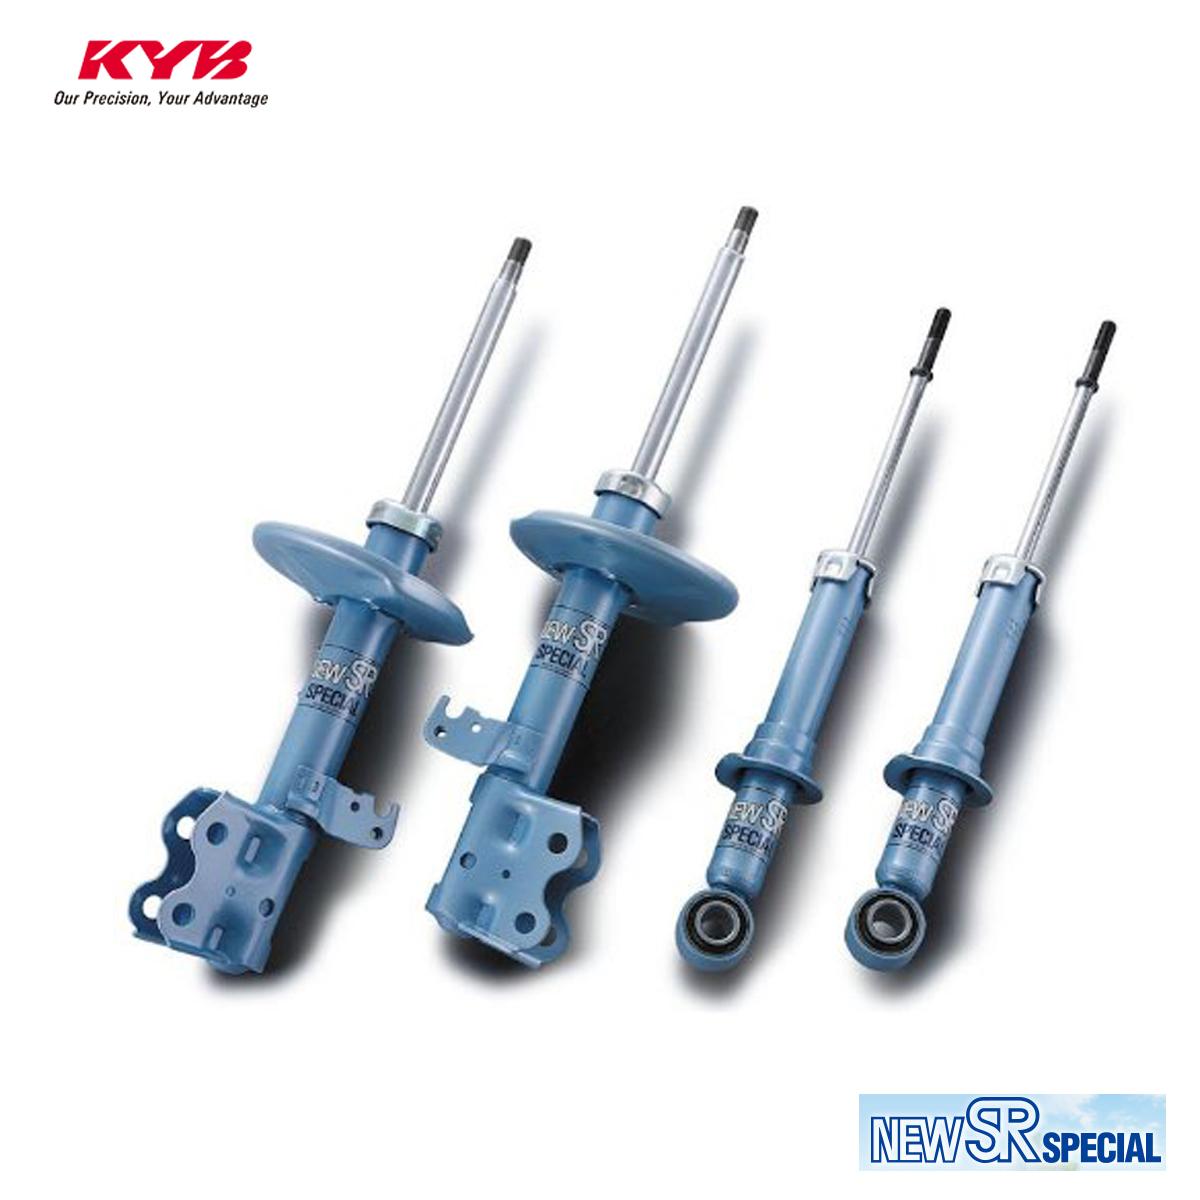 KYB カヤバ カローラフィールダー ZZE122G ショックアブソーバー 1台分 NEW SR SPECIAL NS-52479125 配送先条件有り